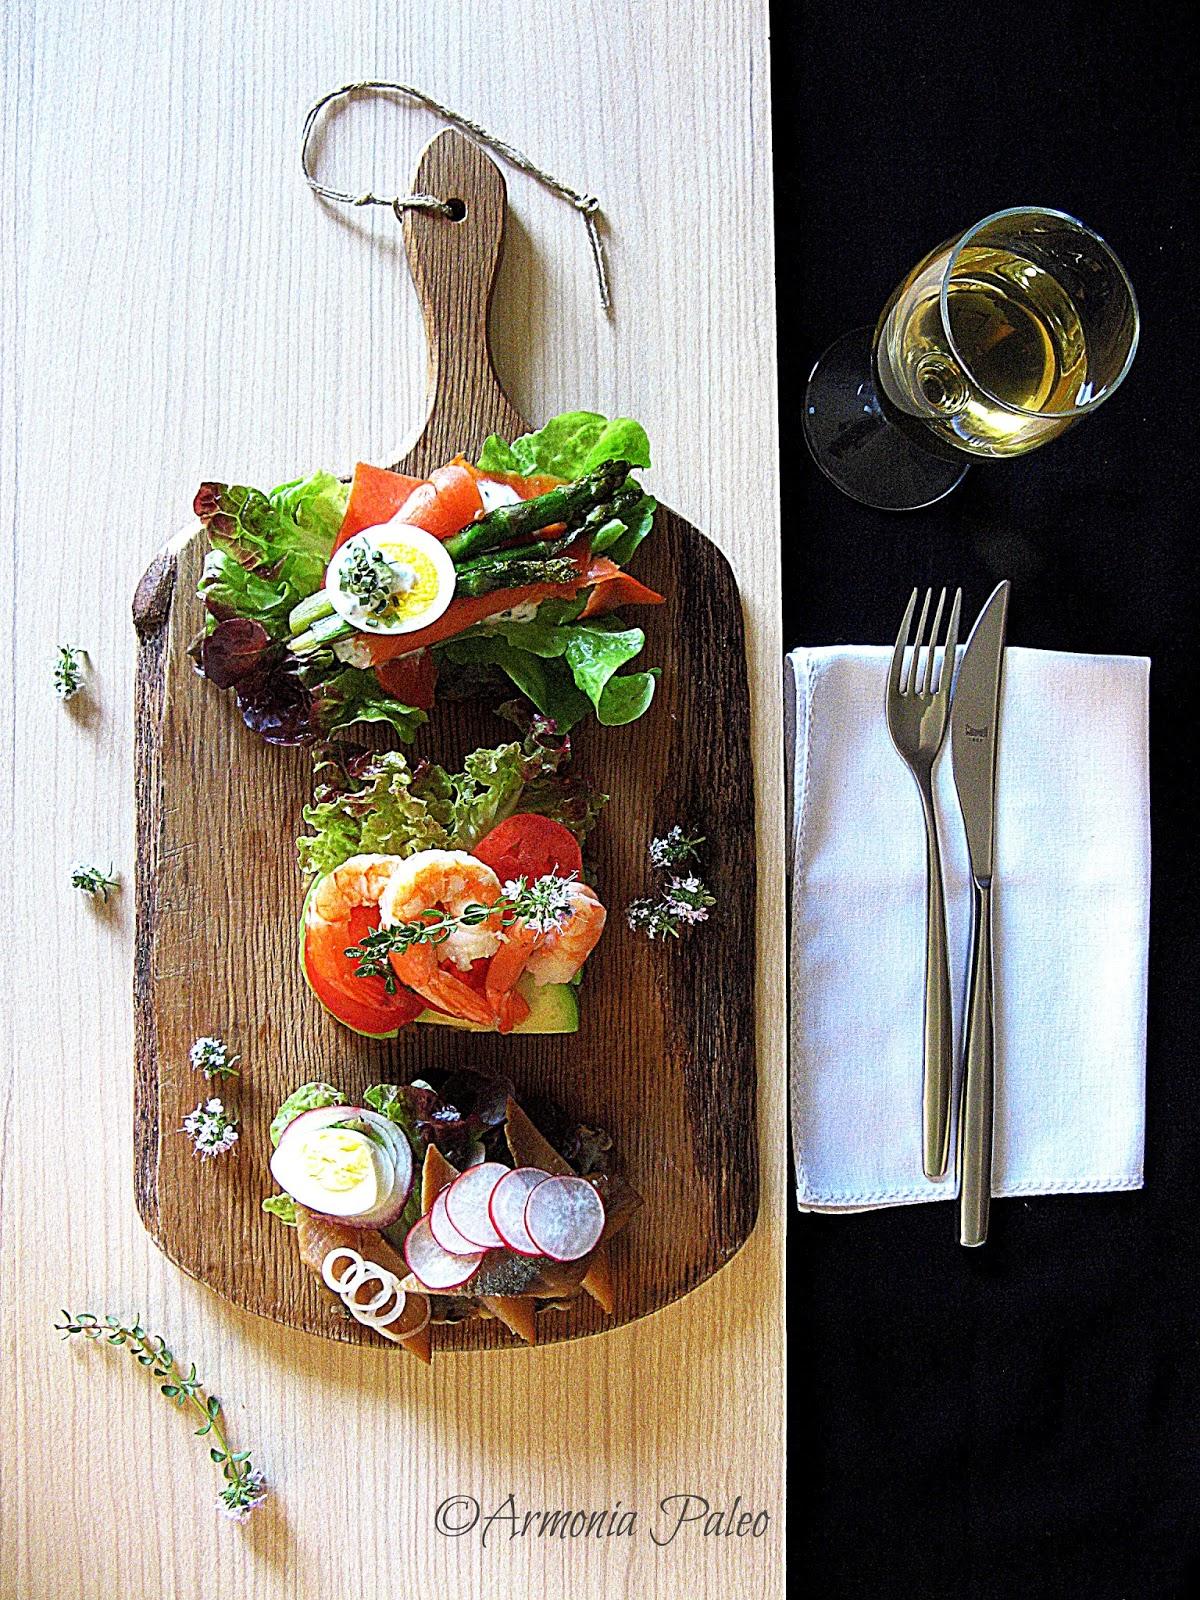 Smørrebrød med Fisk - Panini Danesi con Pesce di Armonia Paleo